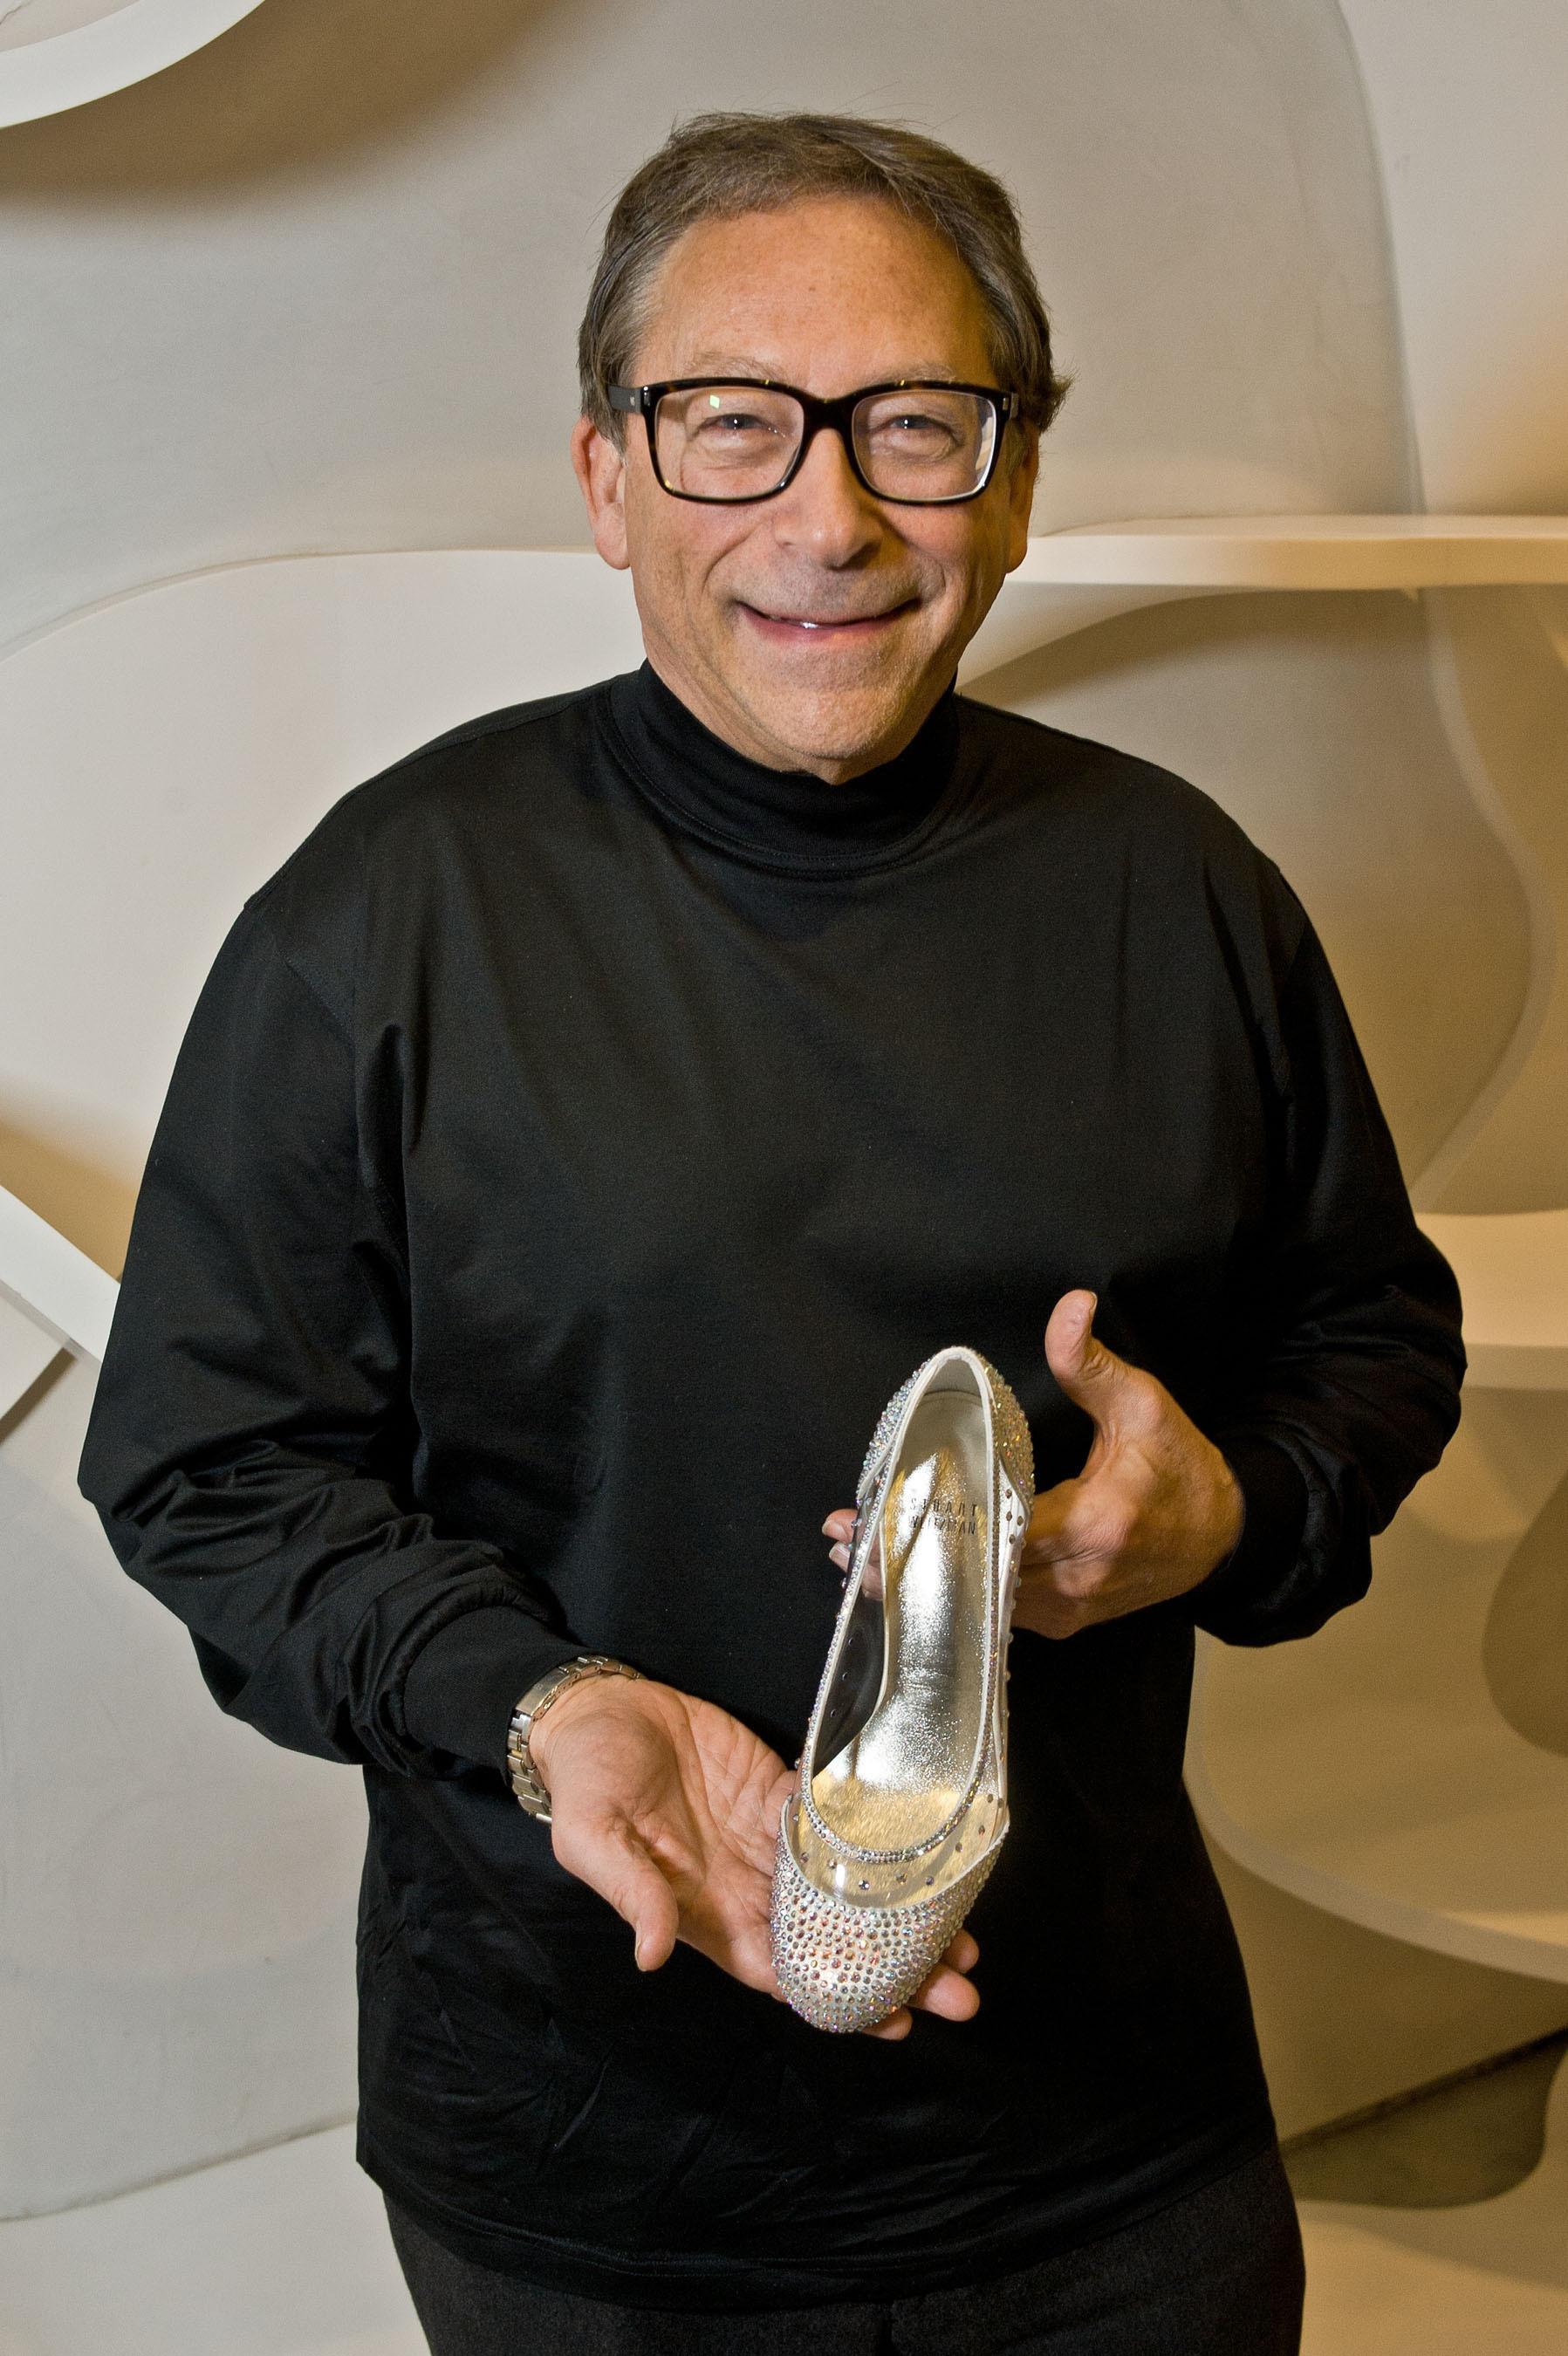 Stuart Weitzman Designs Glass Slipper for New Broadway Production of Cinderella. (PRNewsFoto/Stuart Weitzman Holdings LLC) (PRNewsFoto/STUART WEITZMAN HOLDINGS LLC)